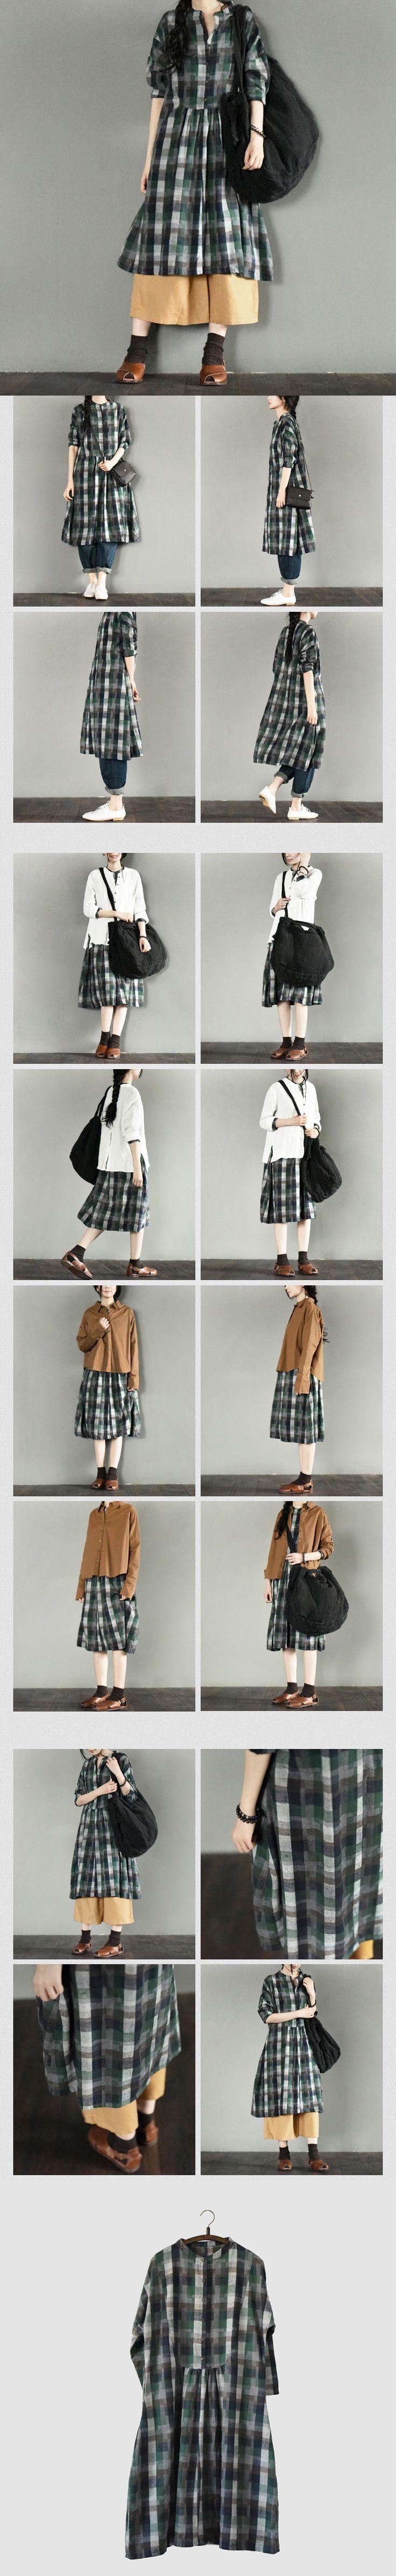 Green Square Maxi Size Dress Plus Size Fashion Women Clothes